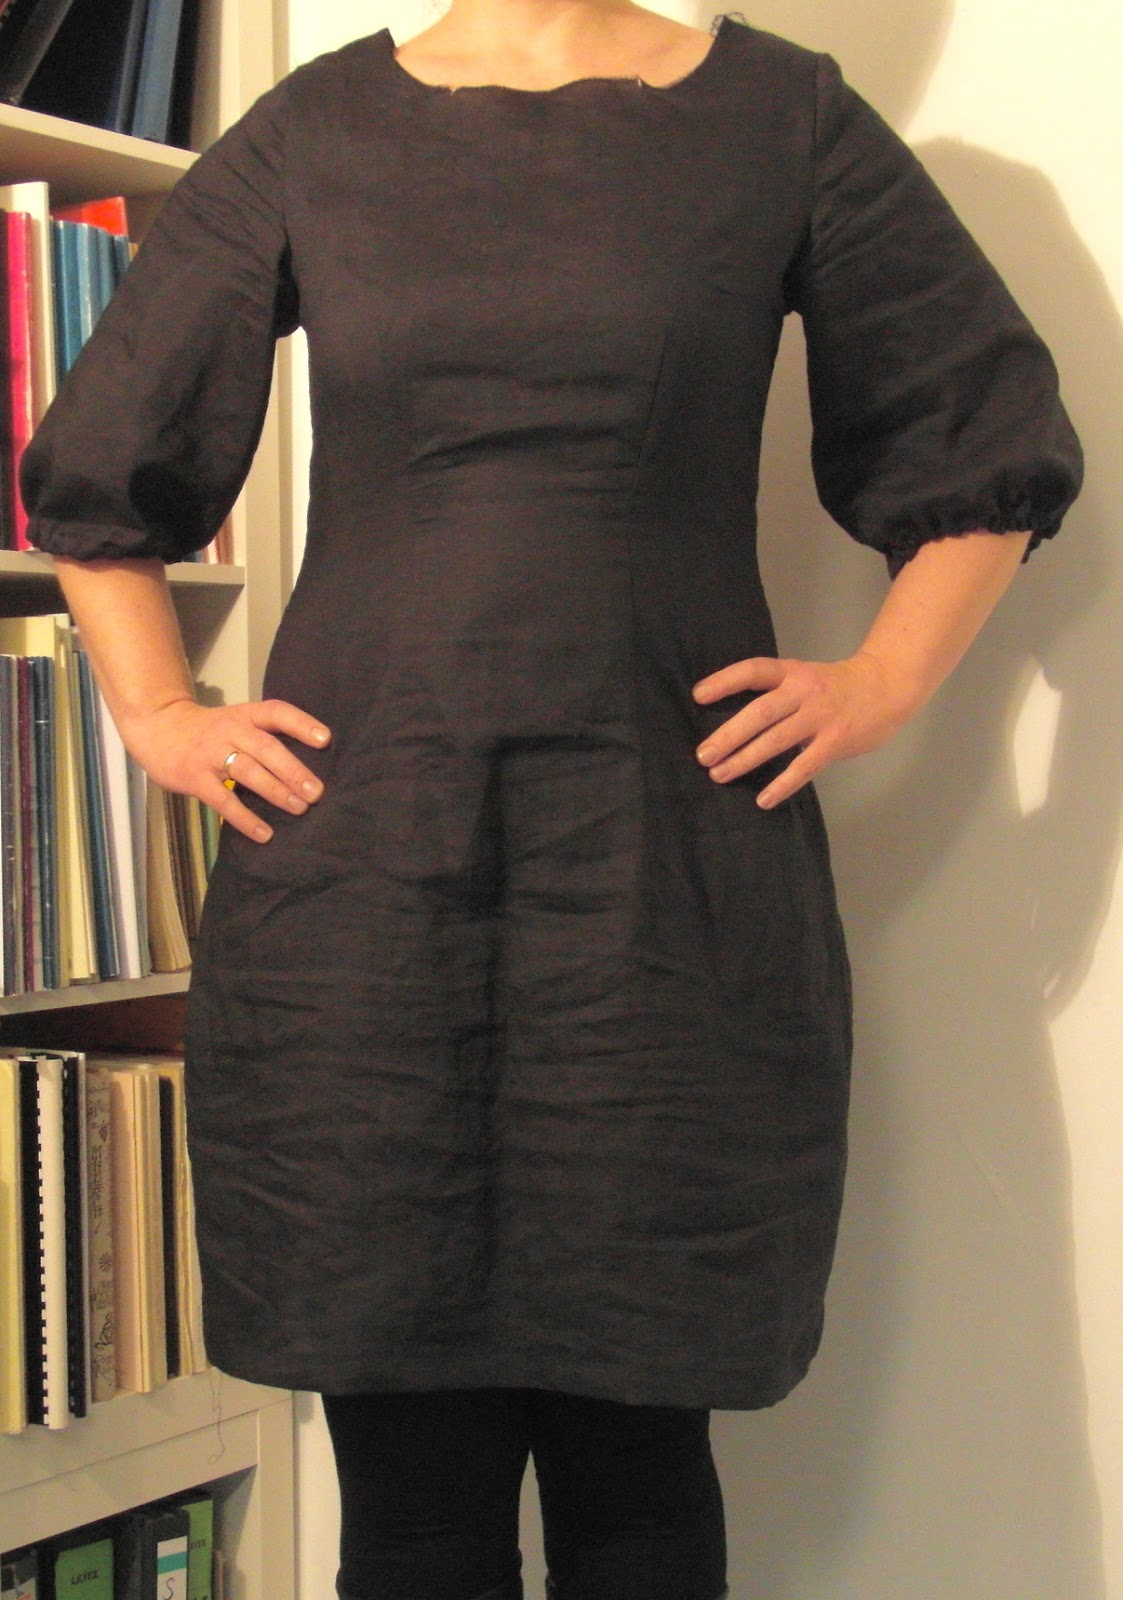 sewing addicted naehsucht weihnachtskleid sew along teil 3 ich n he also bin ich. Black Bedroom Furniture Sets. Home Design Ideas